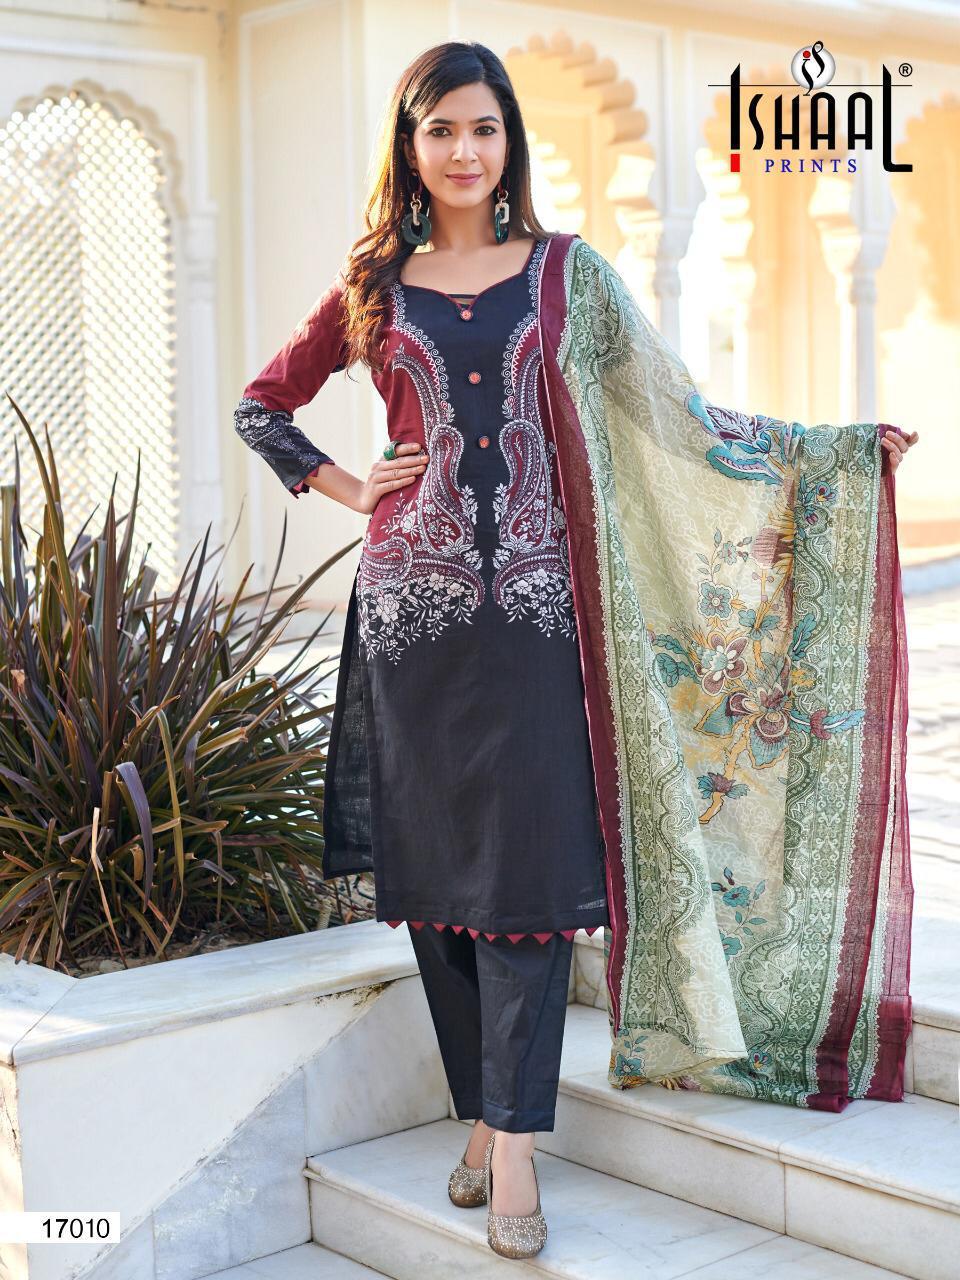 Ishaal Gulmohar Vol 17 Salwar Suit Wholesale Catalog 10 Pcs 12 - Ishaal Gulmohar Vol 17 Salwar Suit Wholesale Catalog 10 Pcs